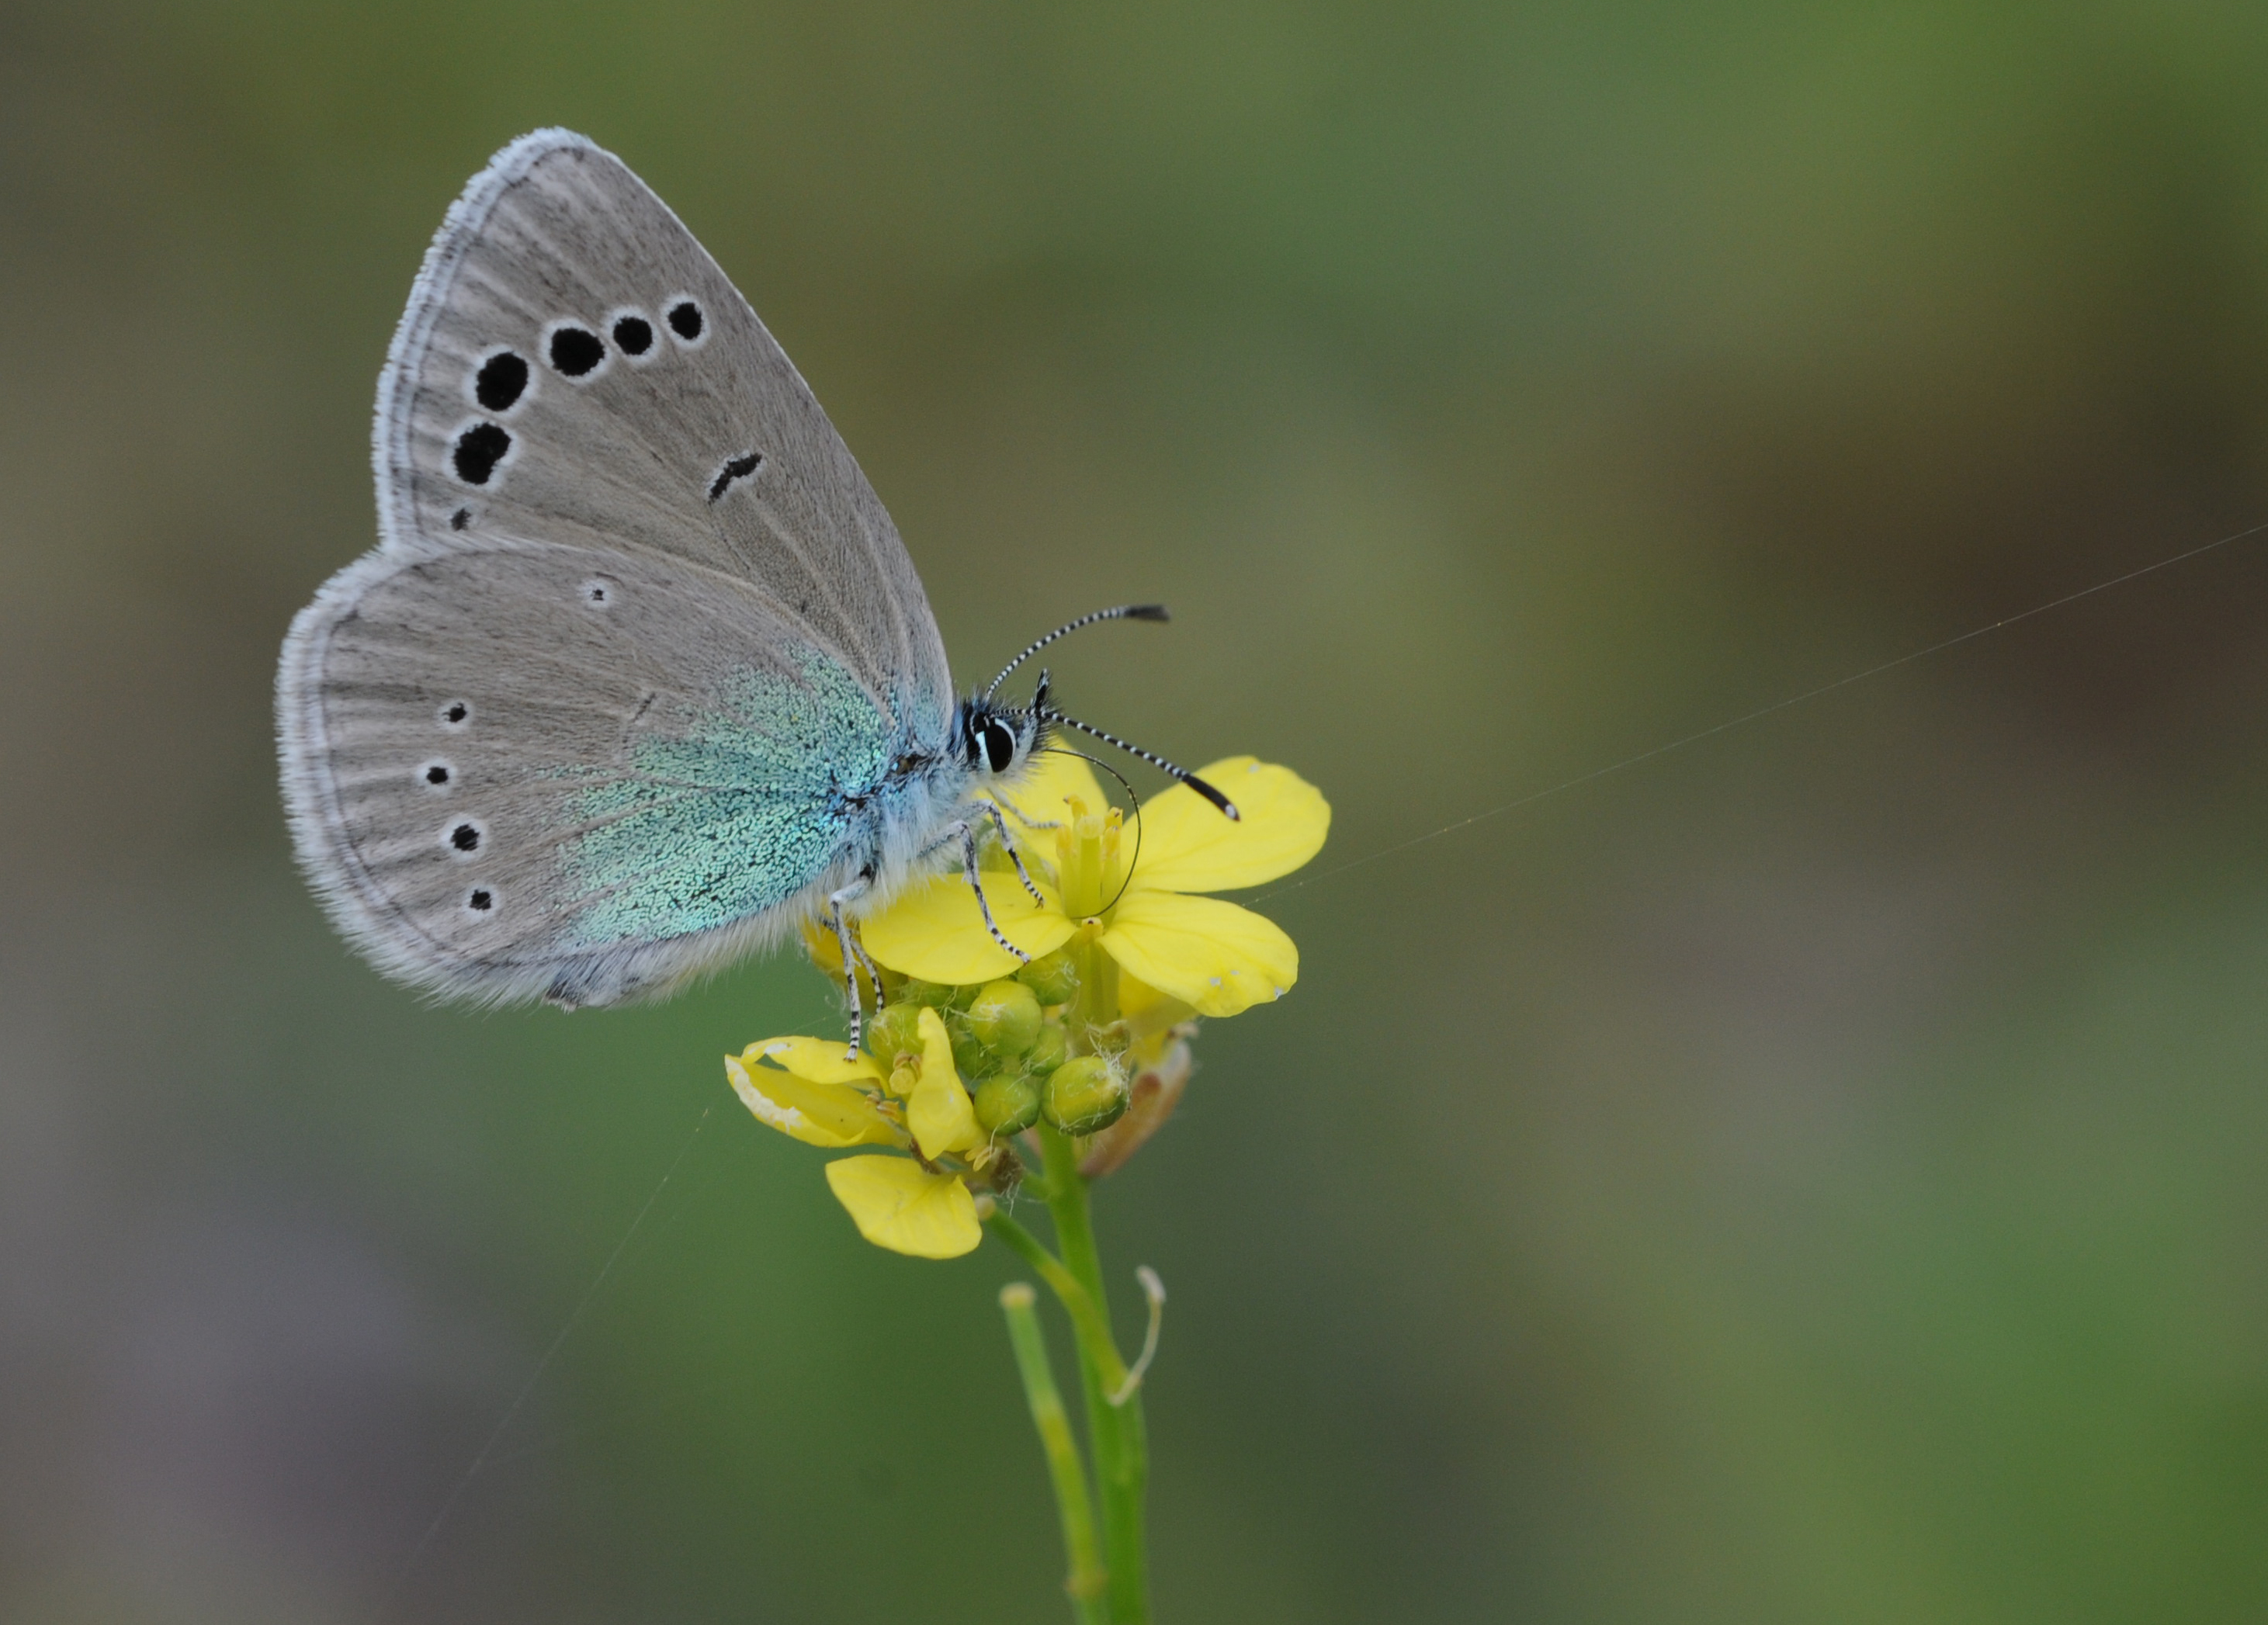 Sưu tập Bộ cánh vảy 3 - Page 38 Butterfly_Green-underside_Blue_-_Glaucopsyche_alexis_1